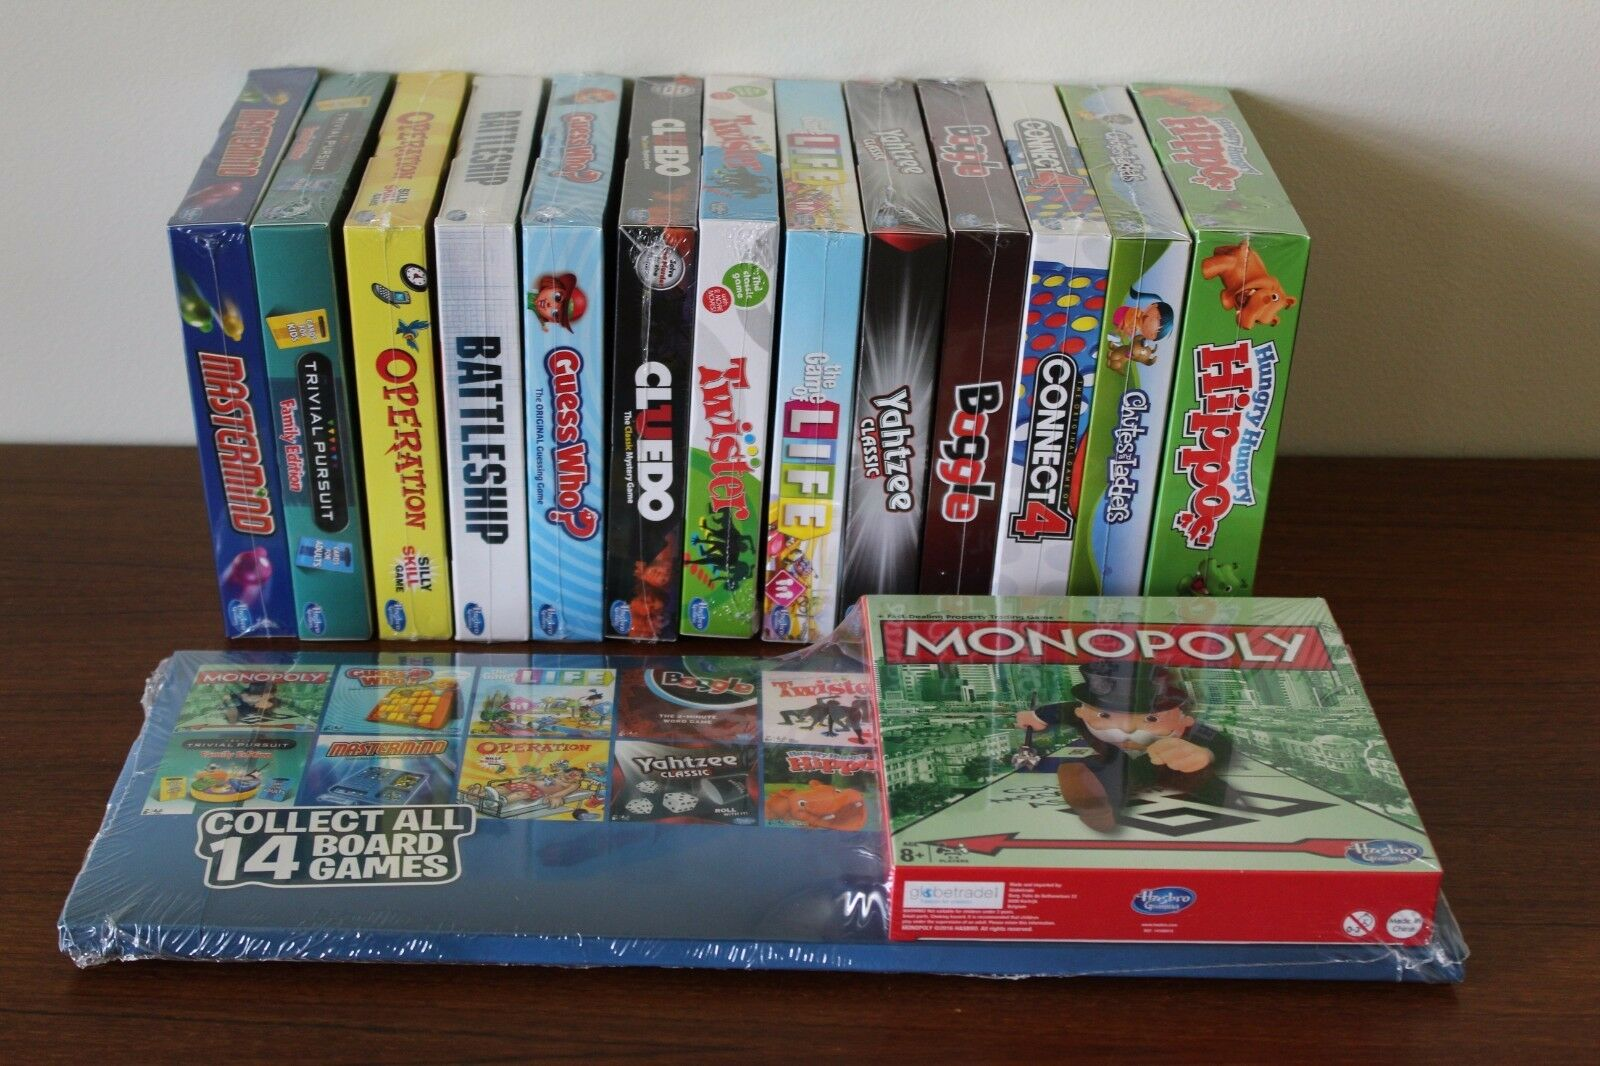 Hasbro familie favoriten - mini - games - sammlung monopoly & fall 14 inc.